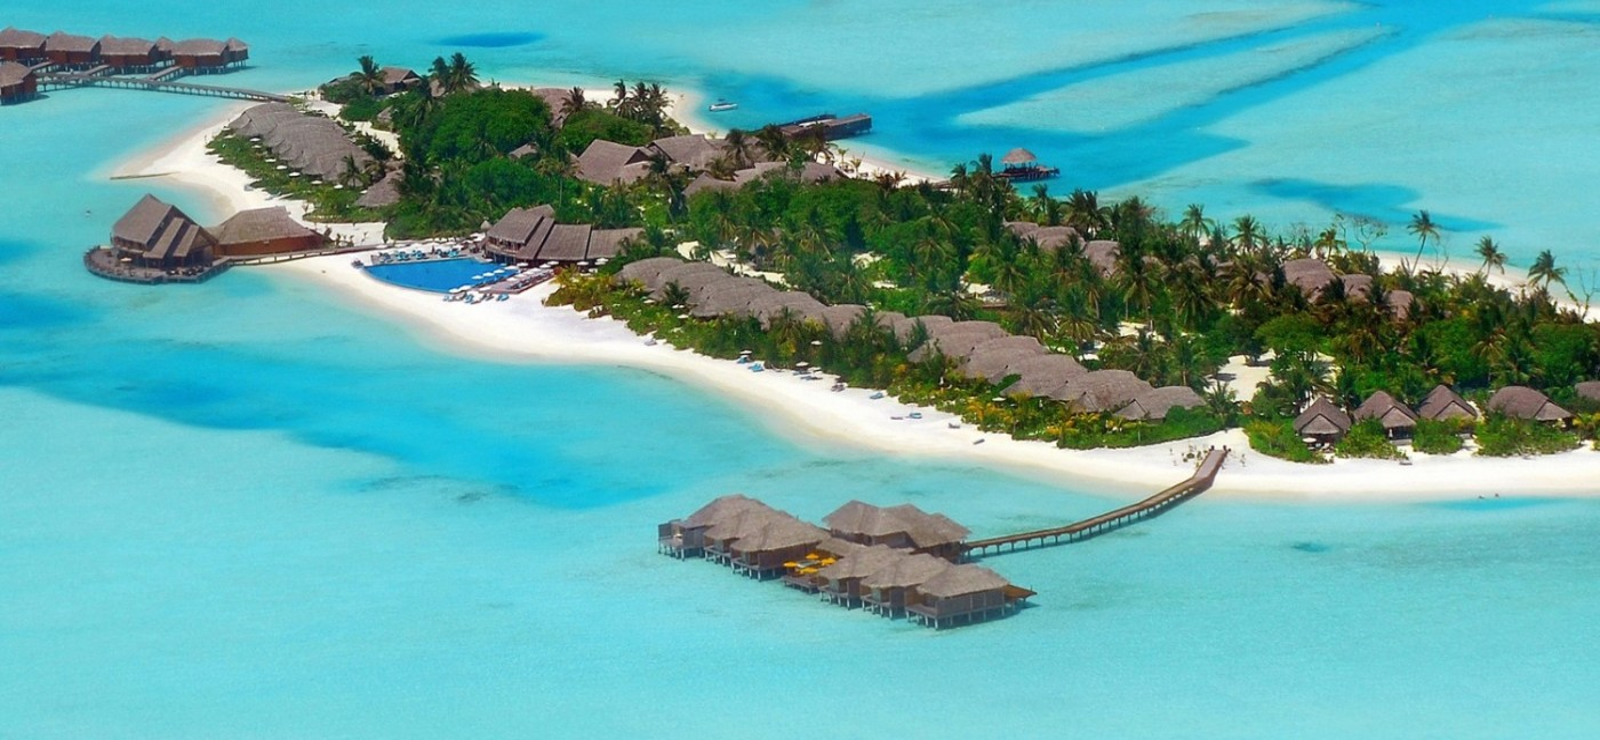 Anantara Resort Maldives Bilder | Bild 1